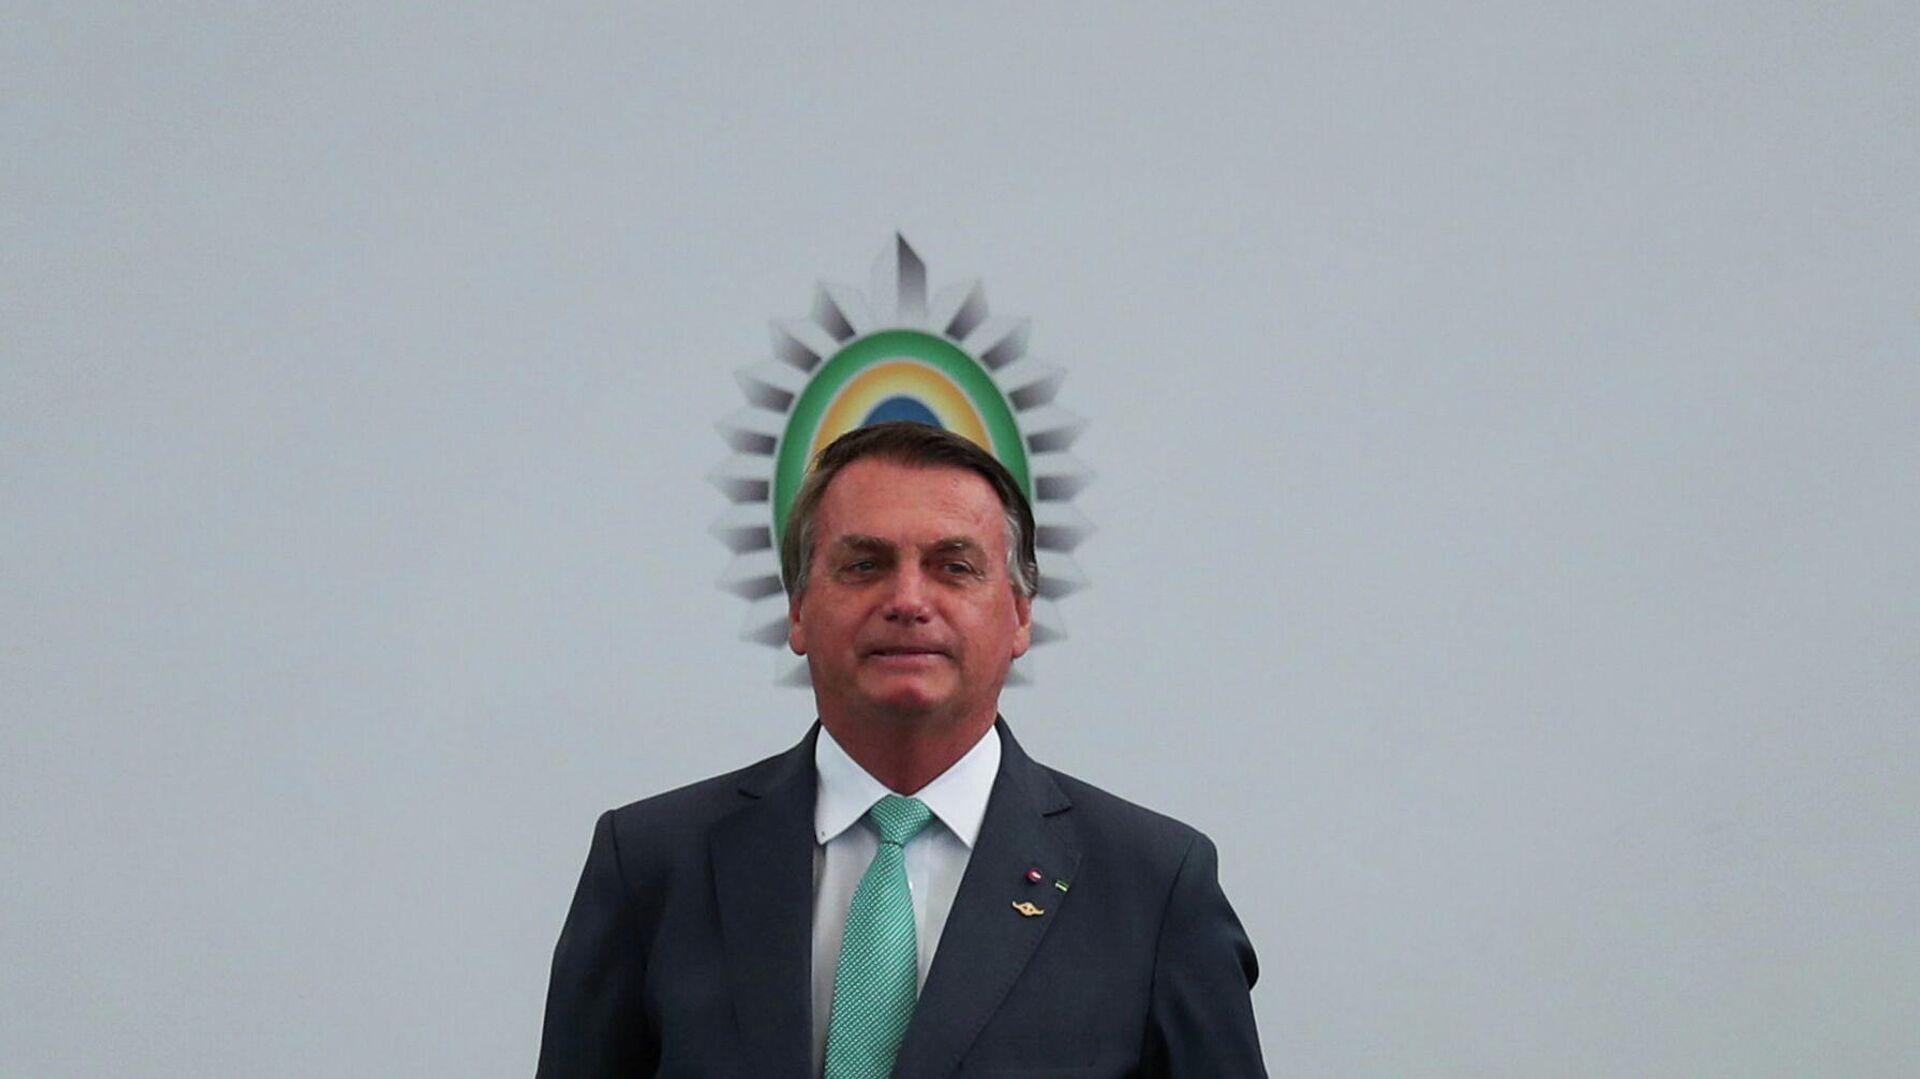 Jair Bolsonaro, presidente de Brasil - Sputnik Mundo, 1920, 10.09.2021